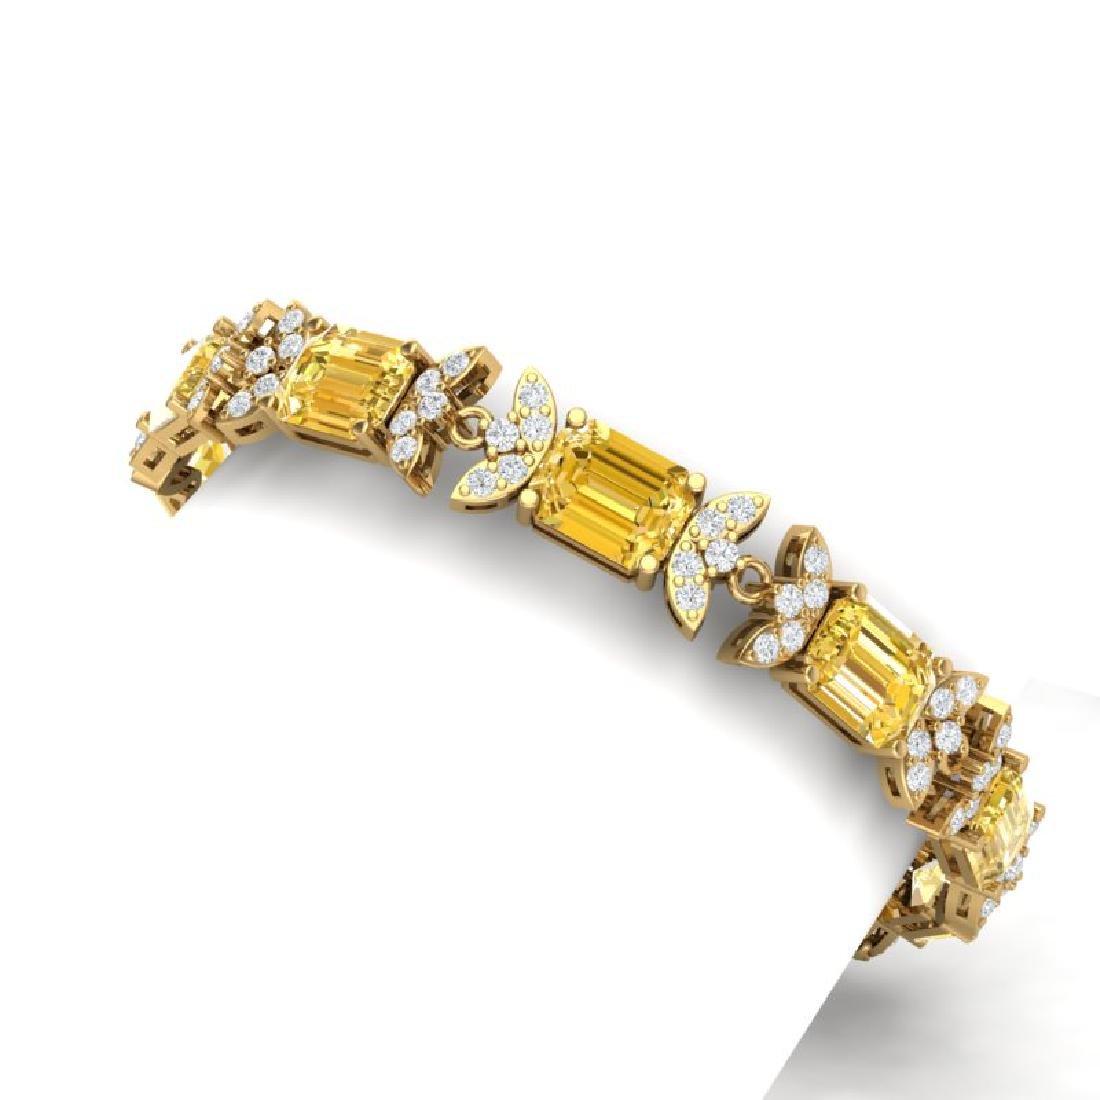 35.21 CTW Royalty Canary Citrine & VS Diamond Bracelet - 2